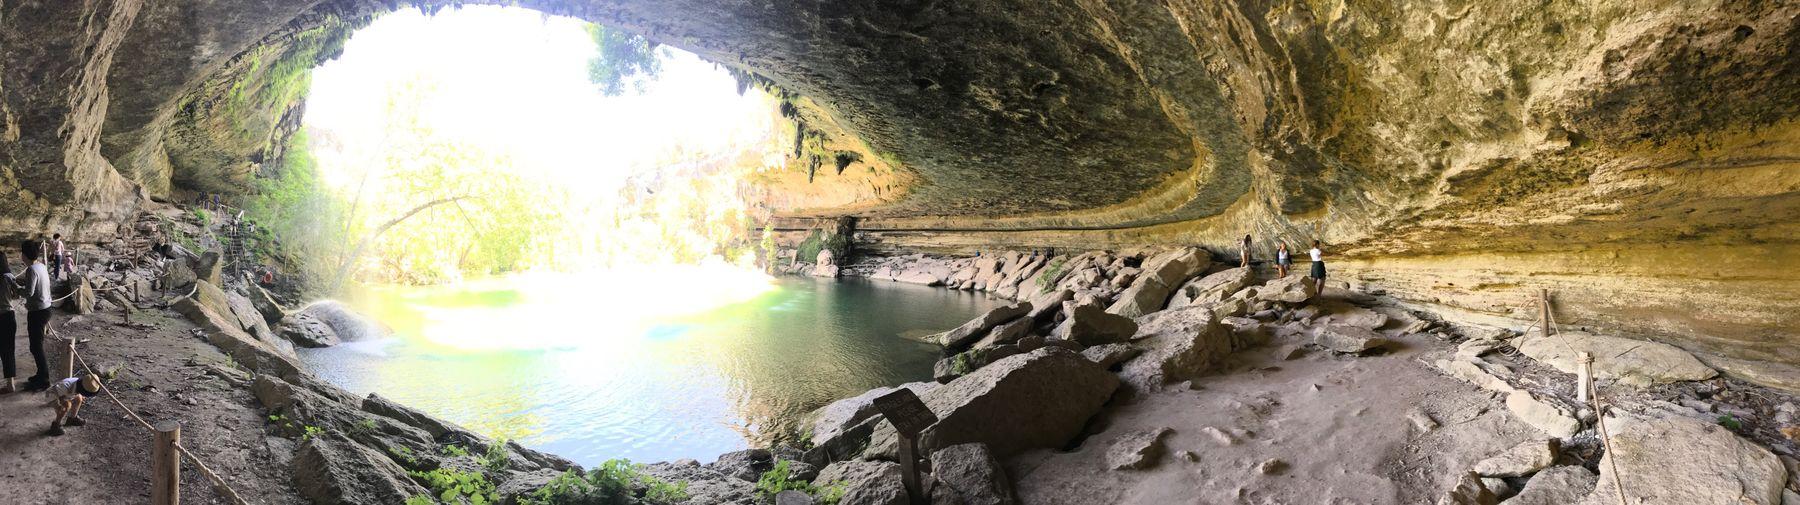 hamilton pool Beauty In Nature